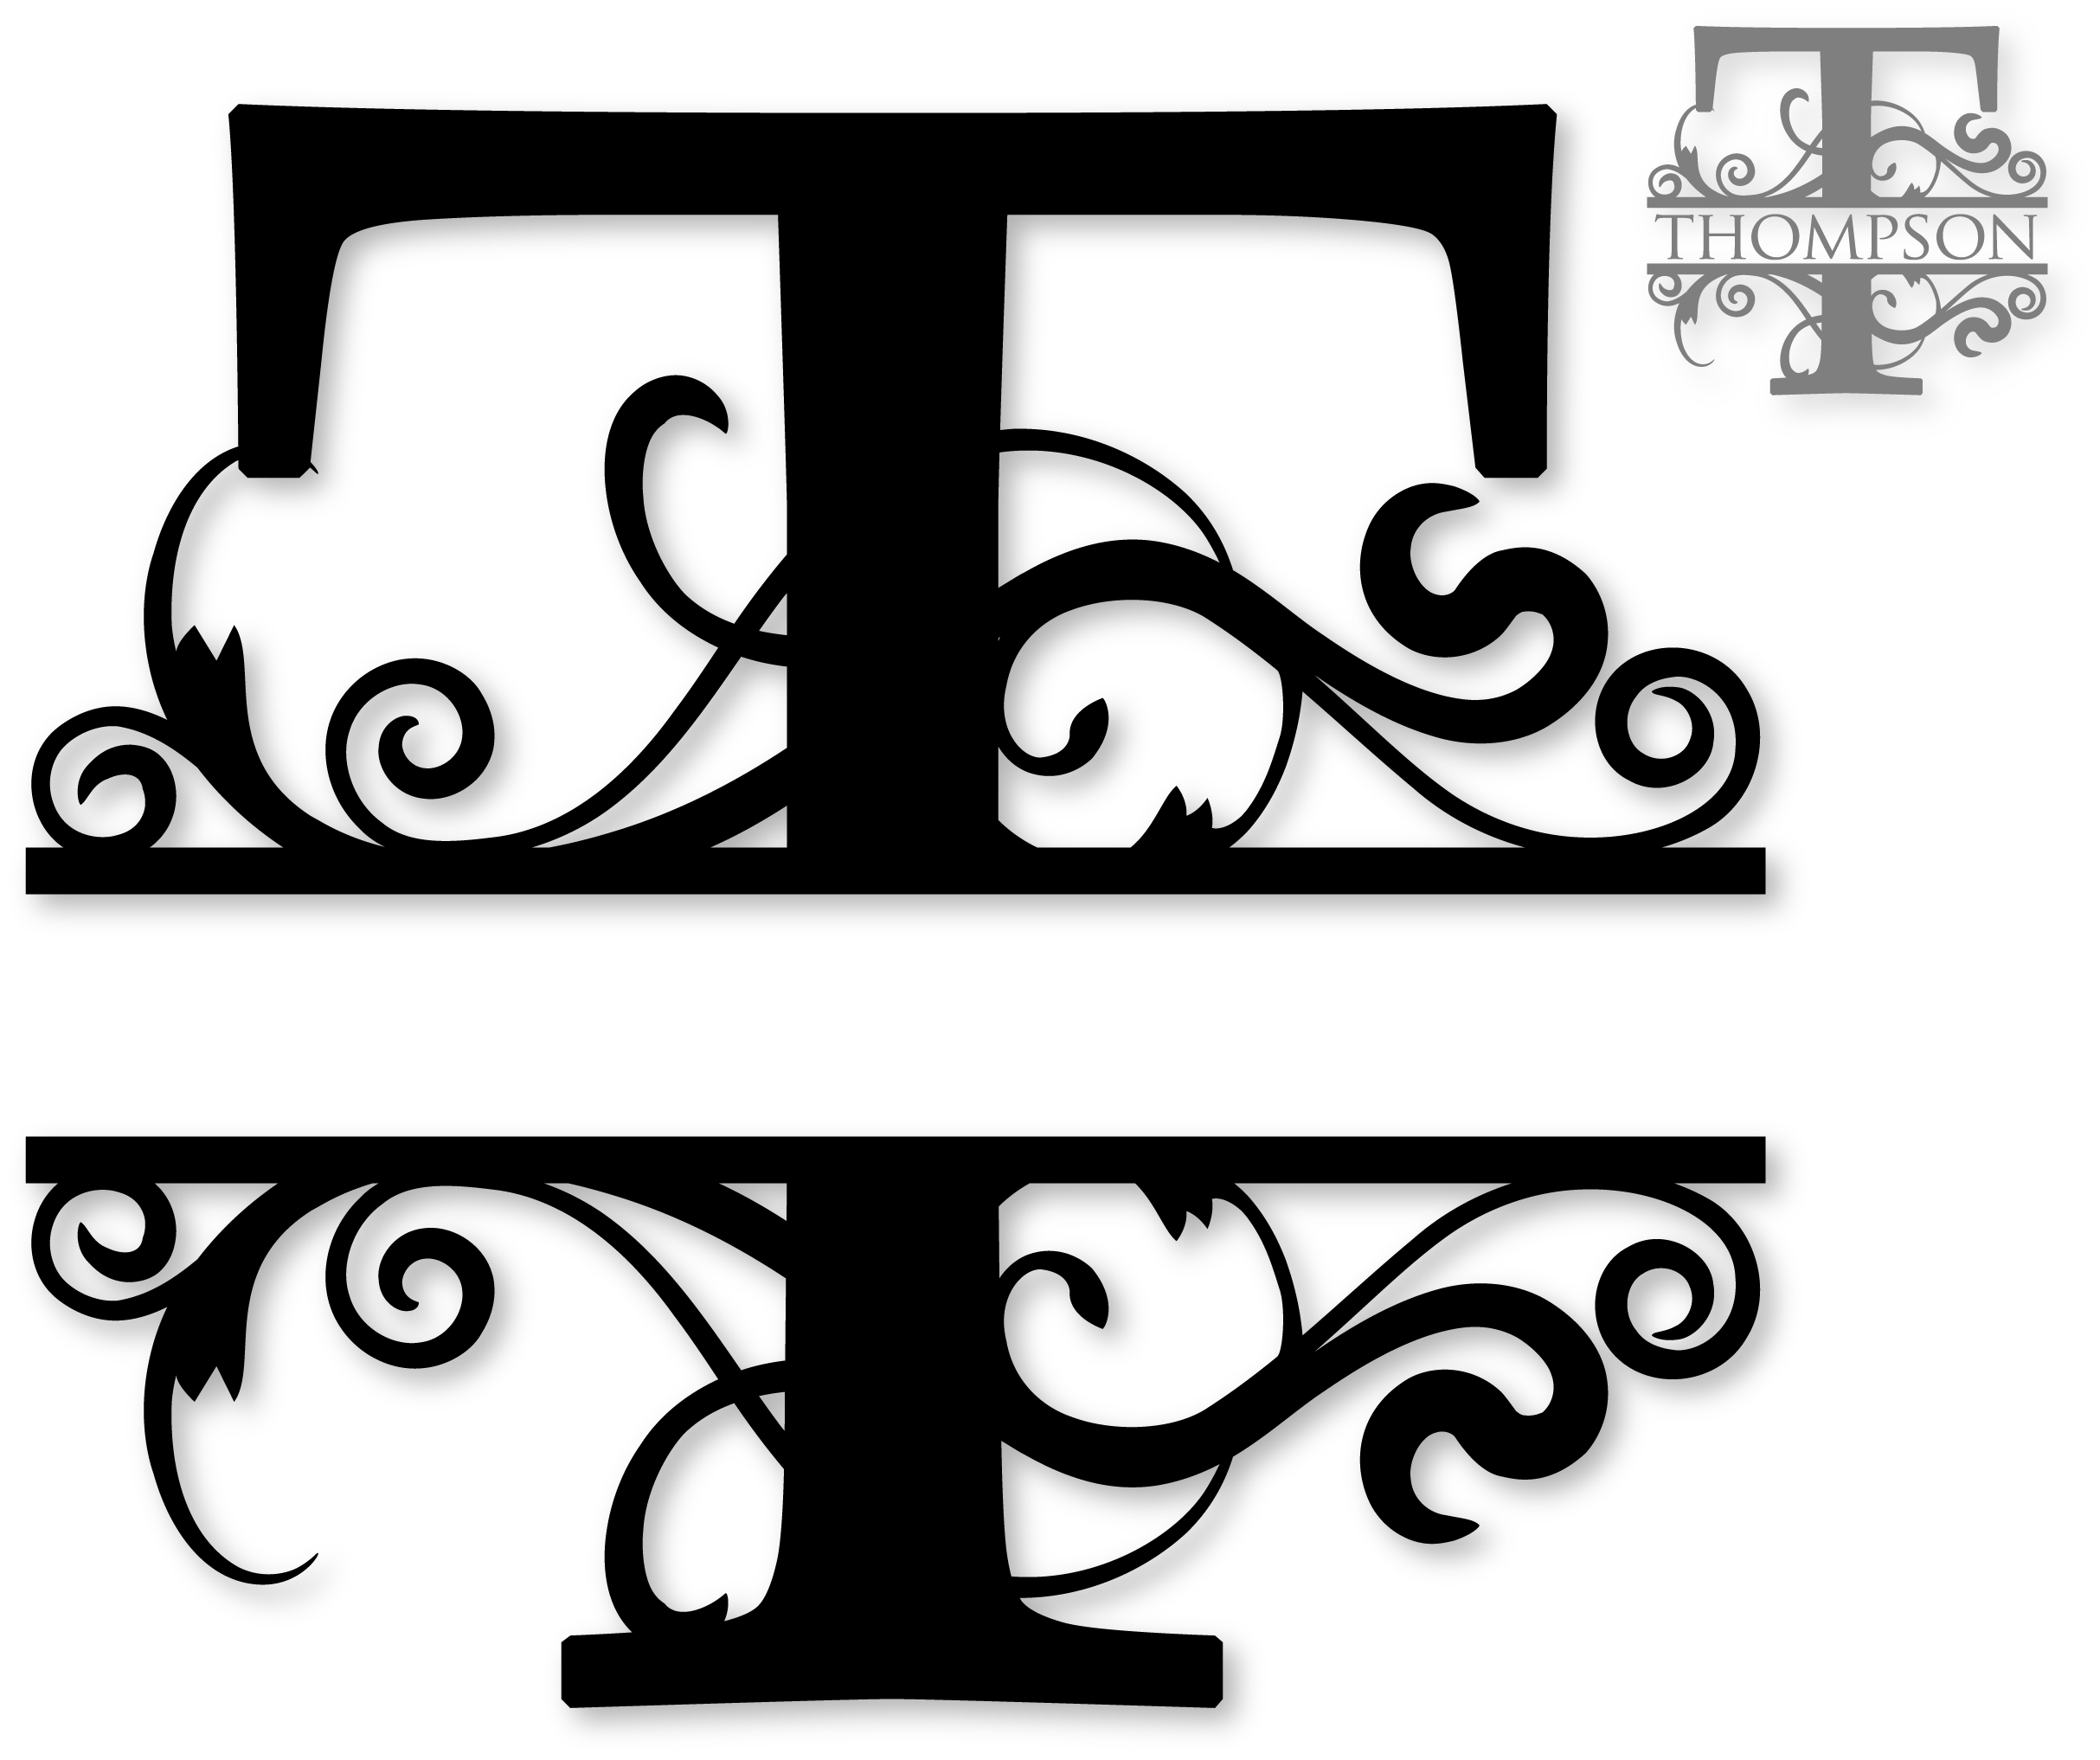 Download View source image | Free monogram fonts, Cricut monogram ...